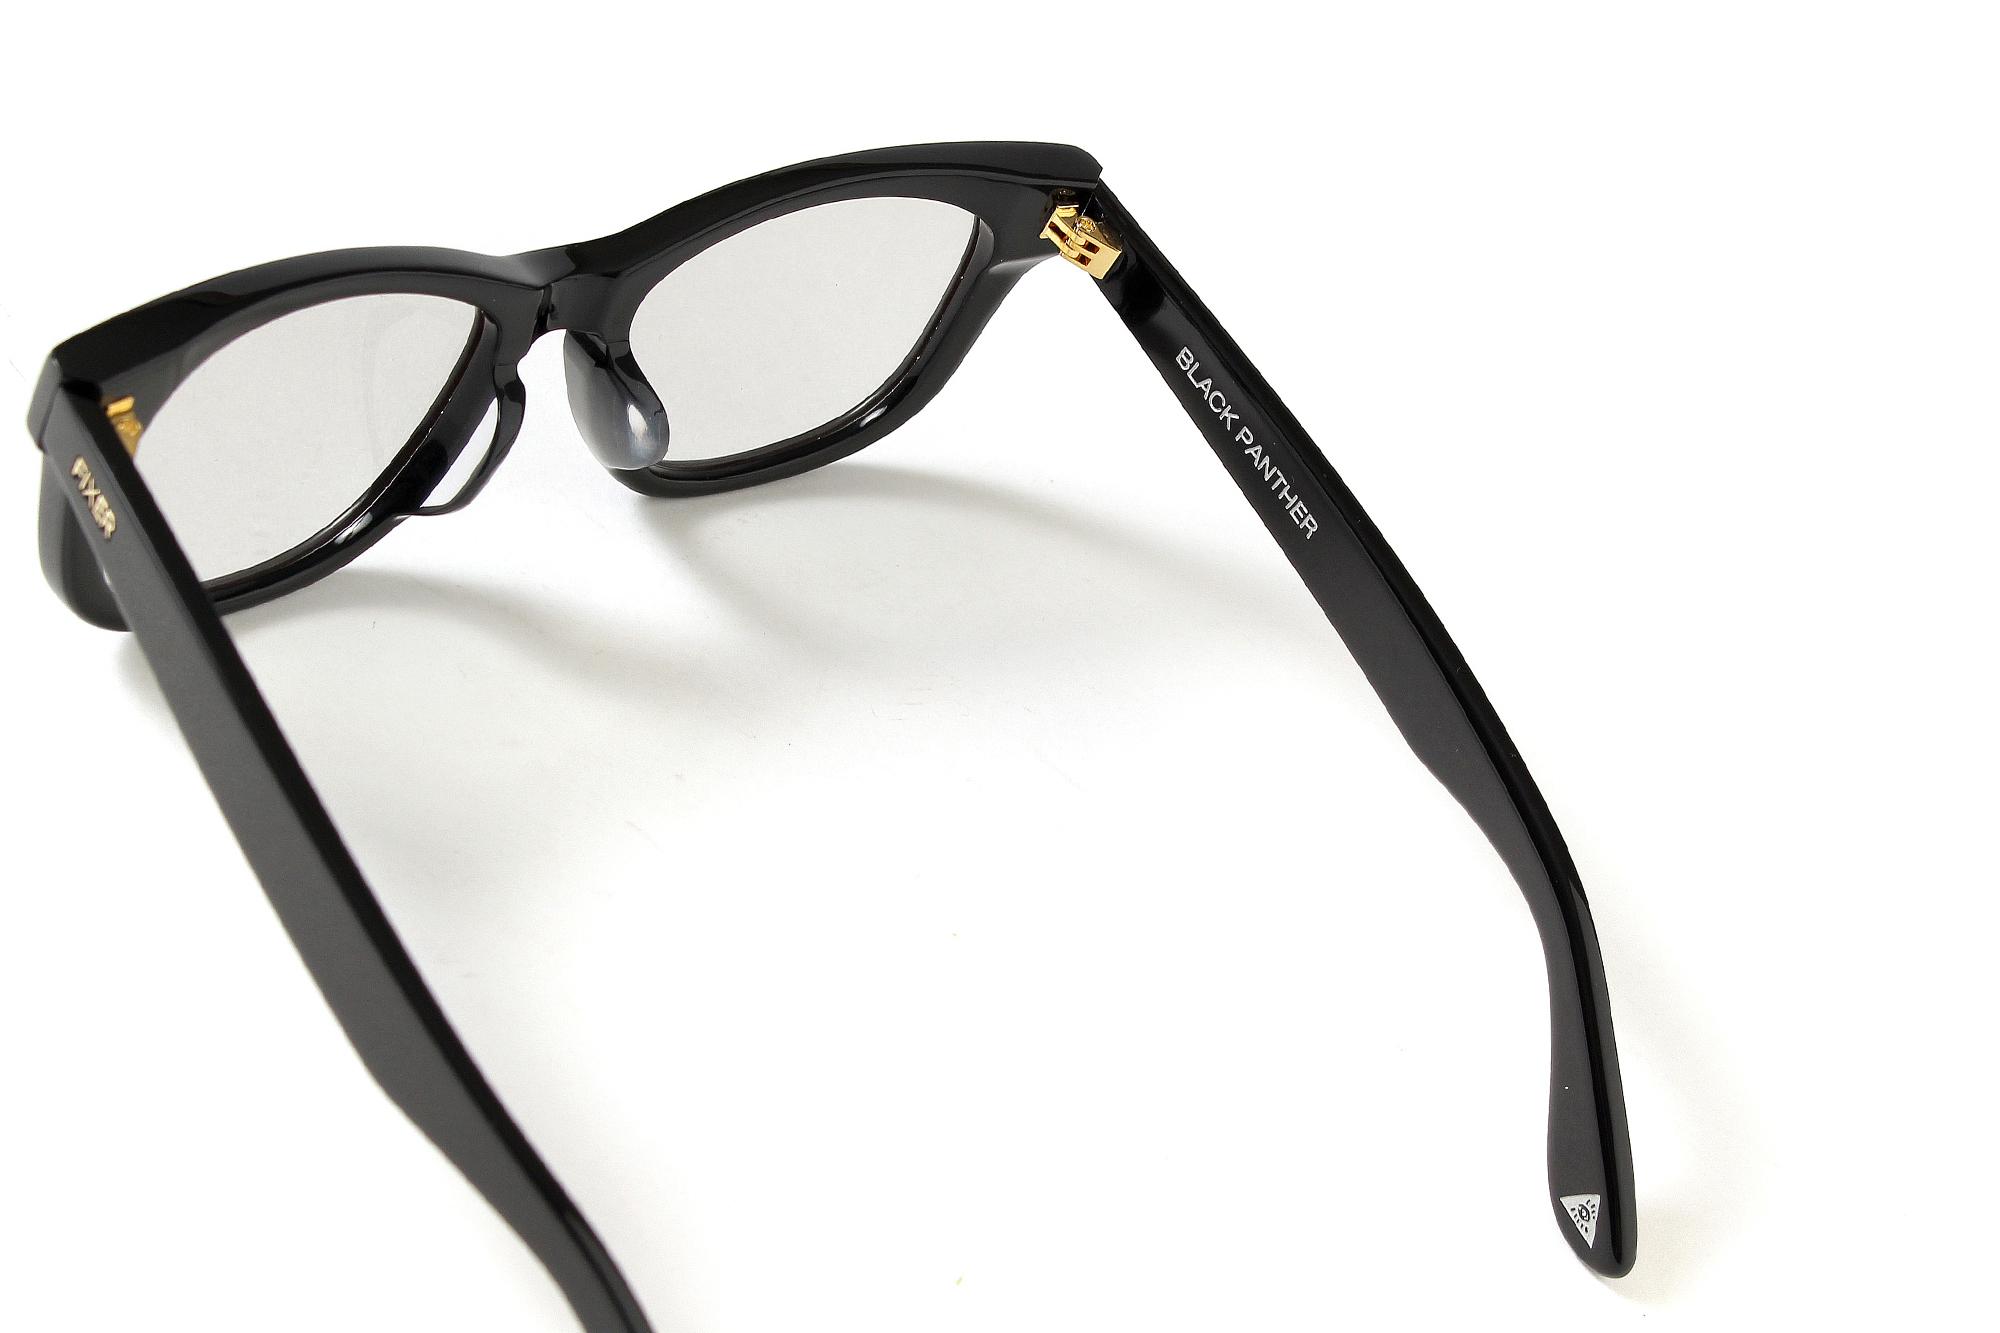 FIXER(フィクサー) BLACK PANTHER(ブラックパンサー) 18K GOLD サングラス BLACK × LIGHT GRAY (ブラック×ライトグレー) 【Special Model】【ご予約受付中】 愛知 名古屋 Alto e Diritto altoediritto アルトエデリット